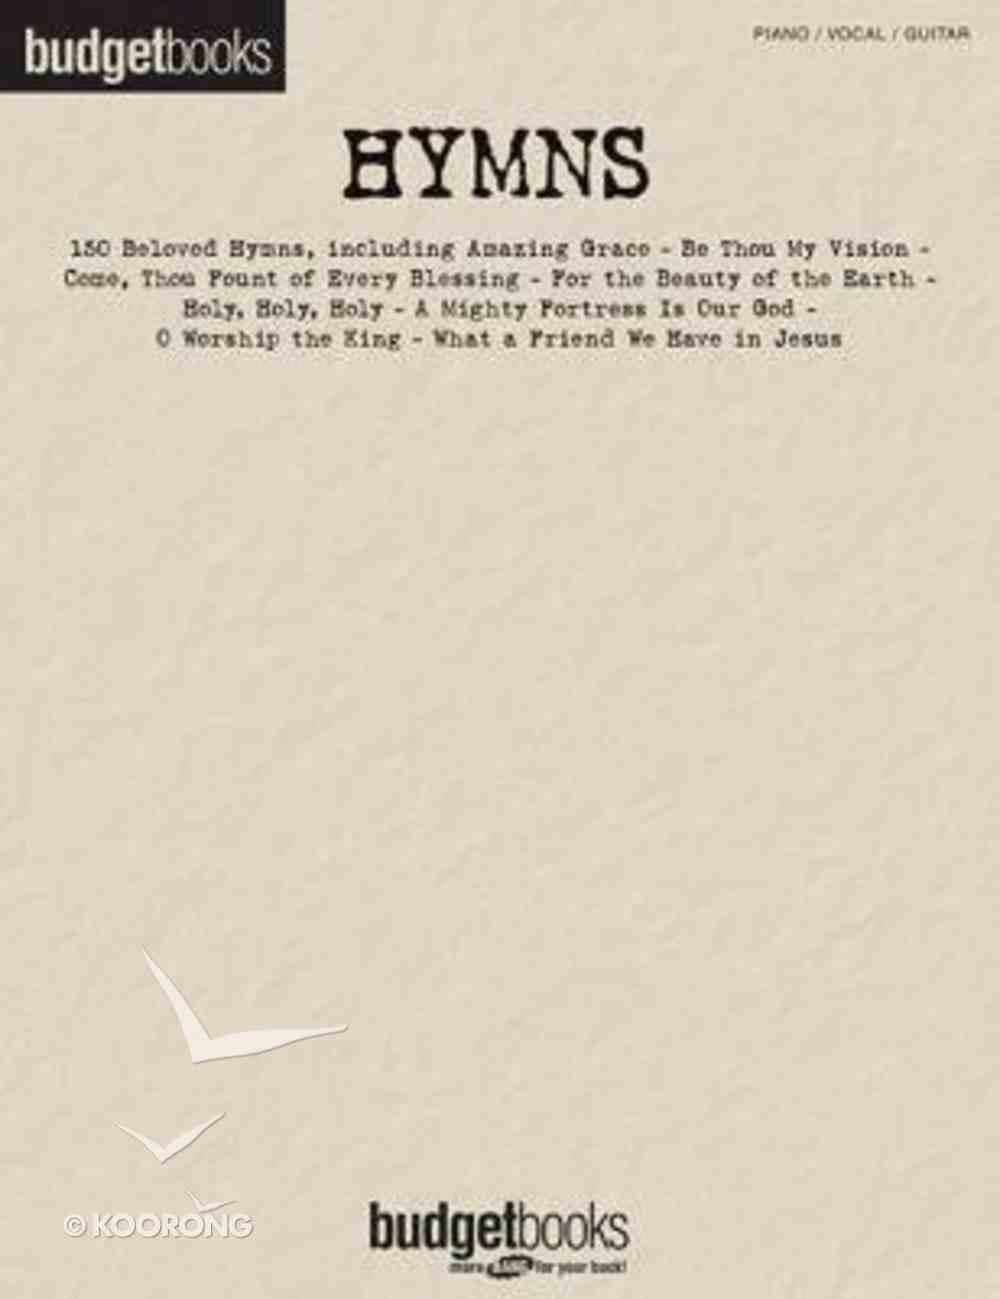 Hymns: Piano/Vocal/Guitar Paperback